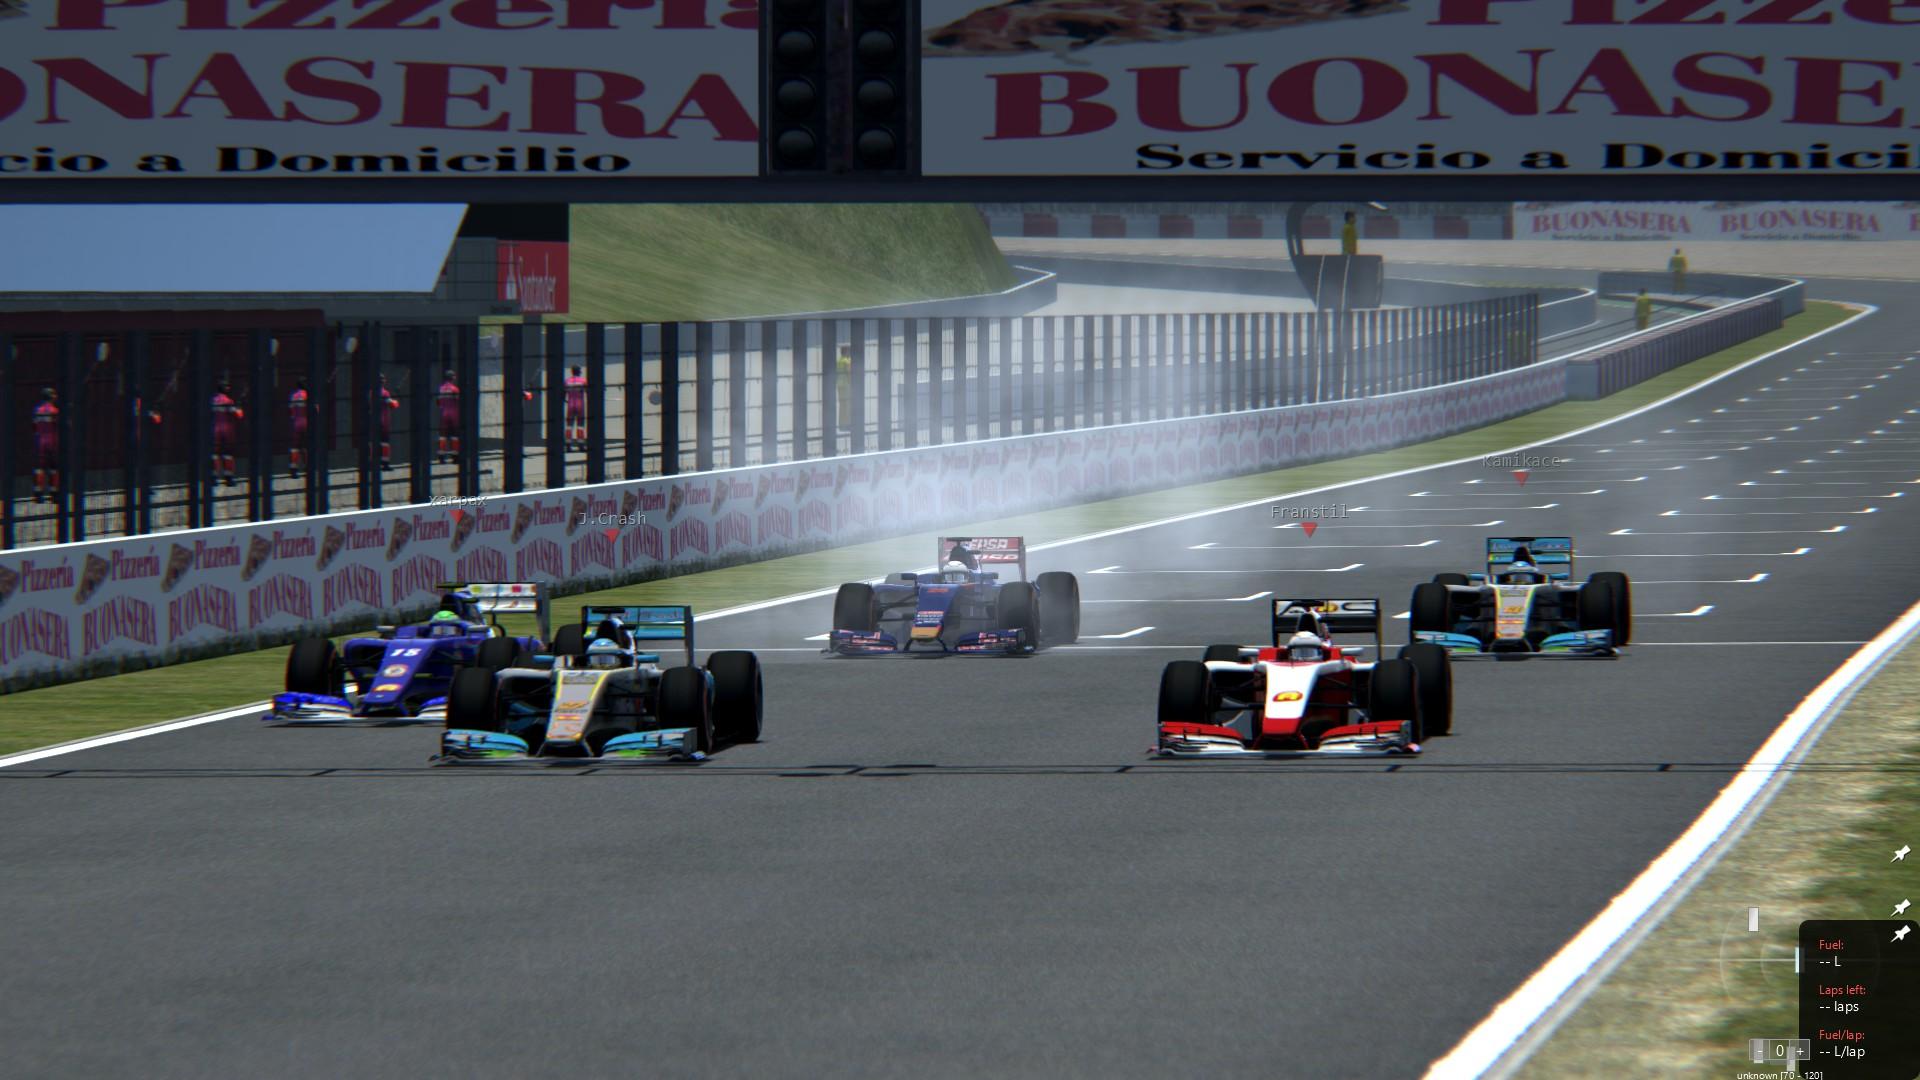 Gp de España F1 Paralela Assetto F1 Spain  B0CF3380A2ED7F61097175654D7E5C54EE1DEA26